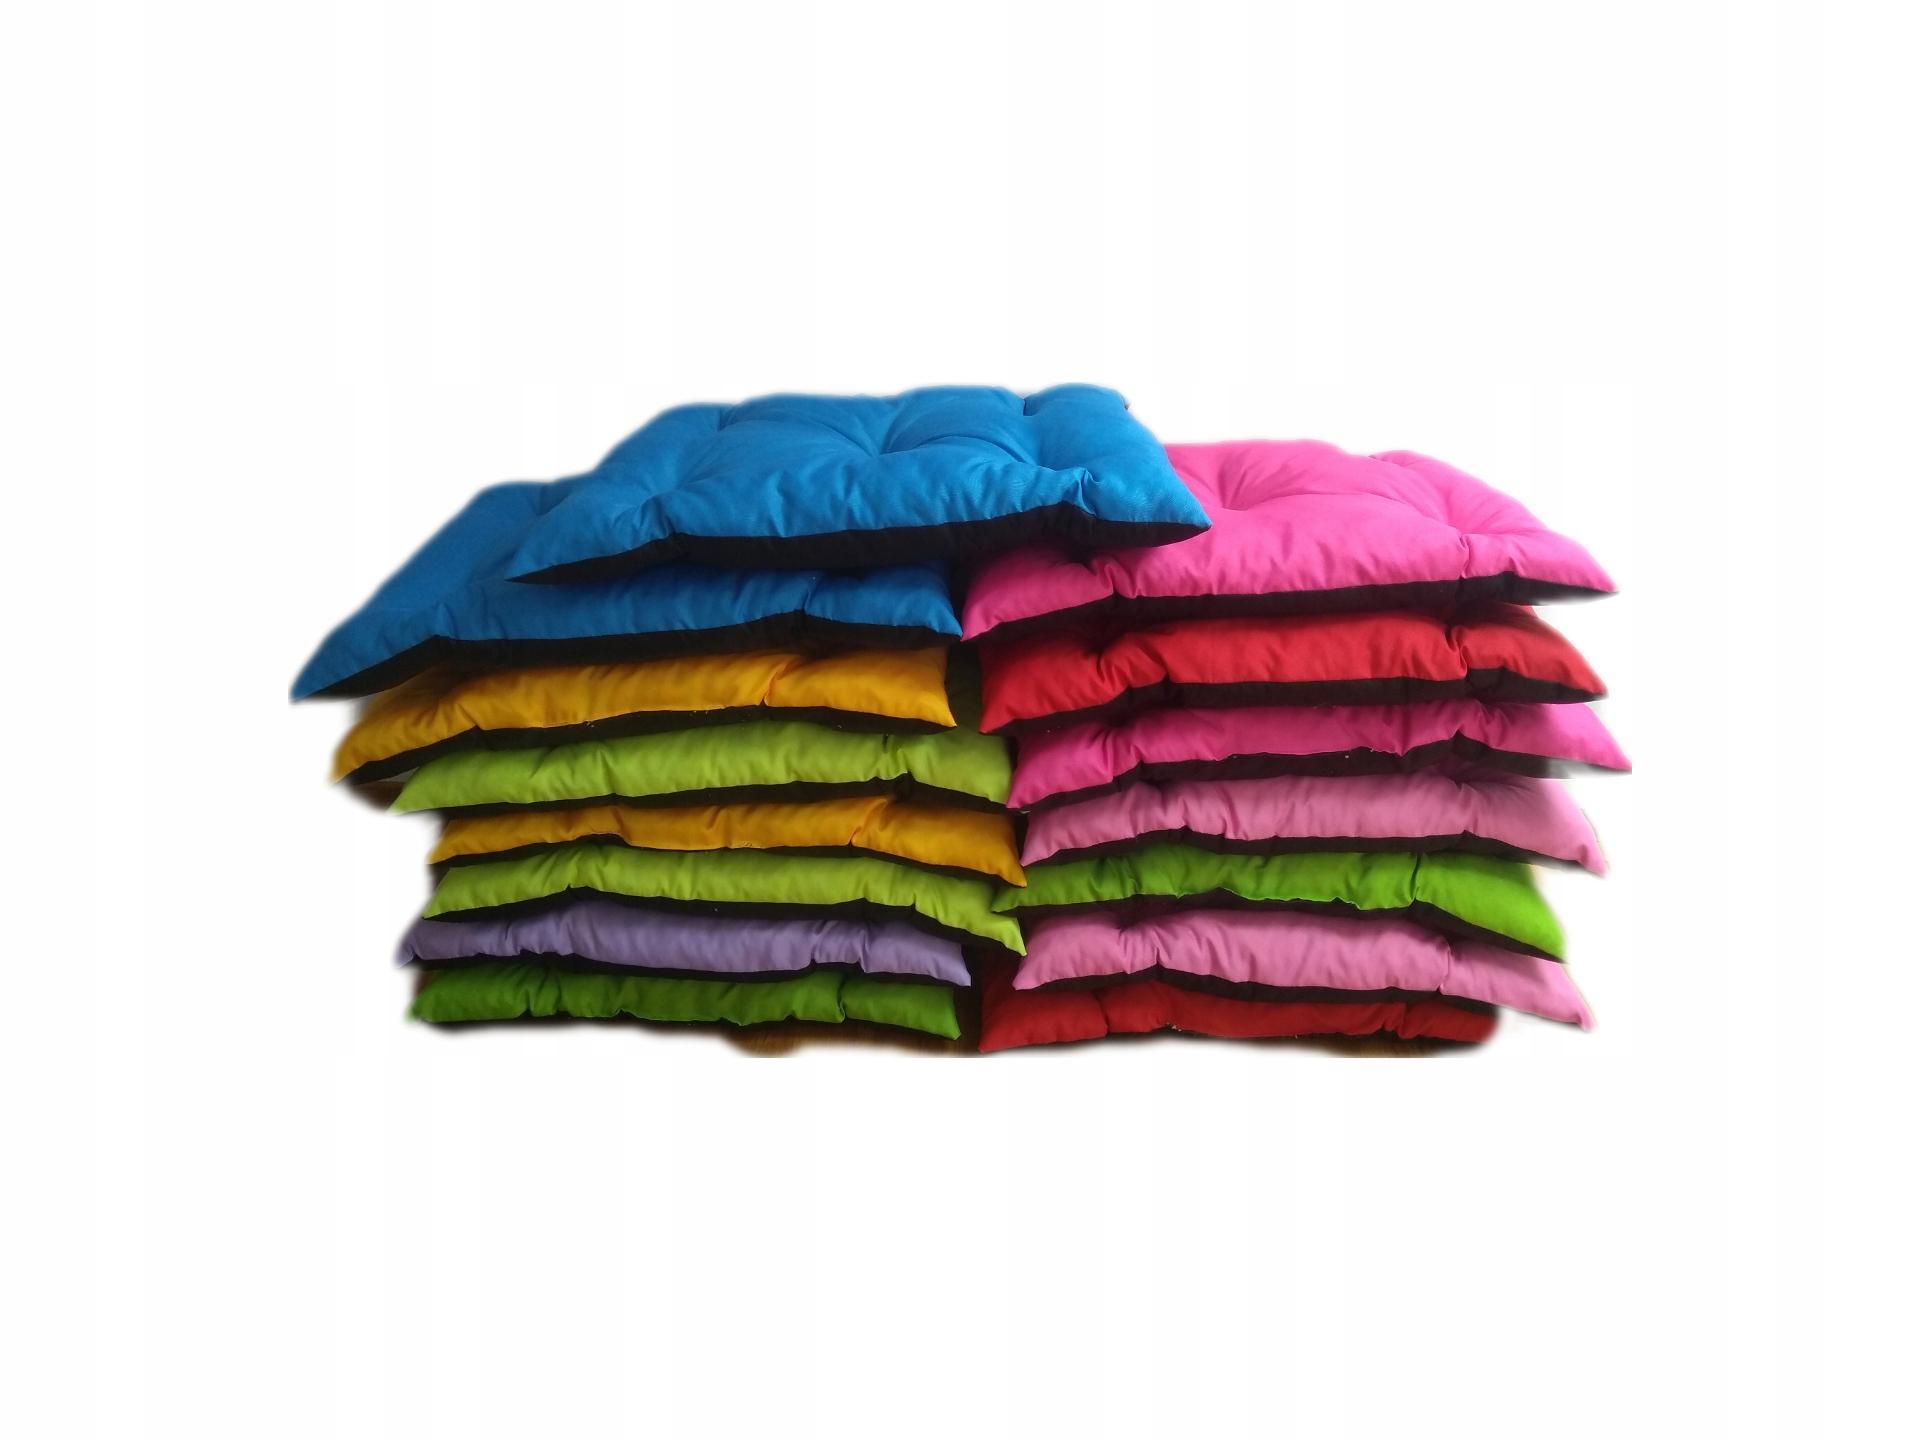 Подушка для собаки / кошки 60х90 + ИМЯ БЕСПЛАТНО